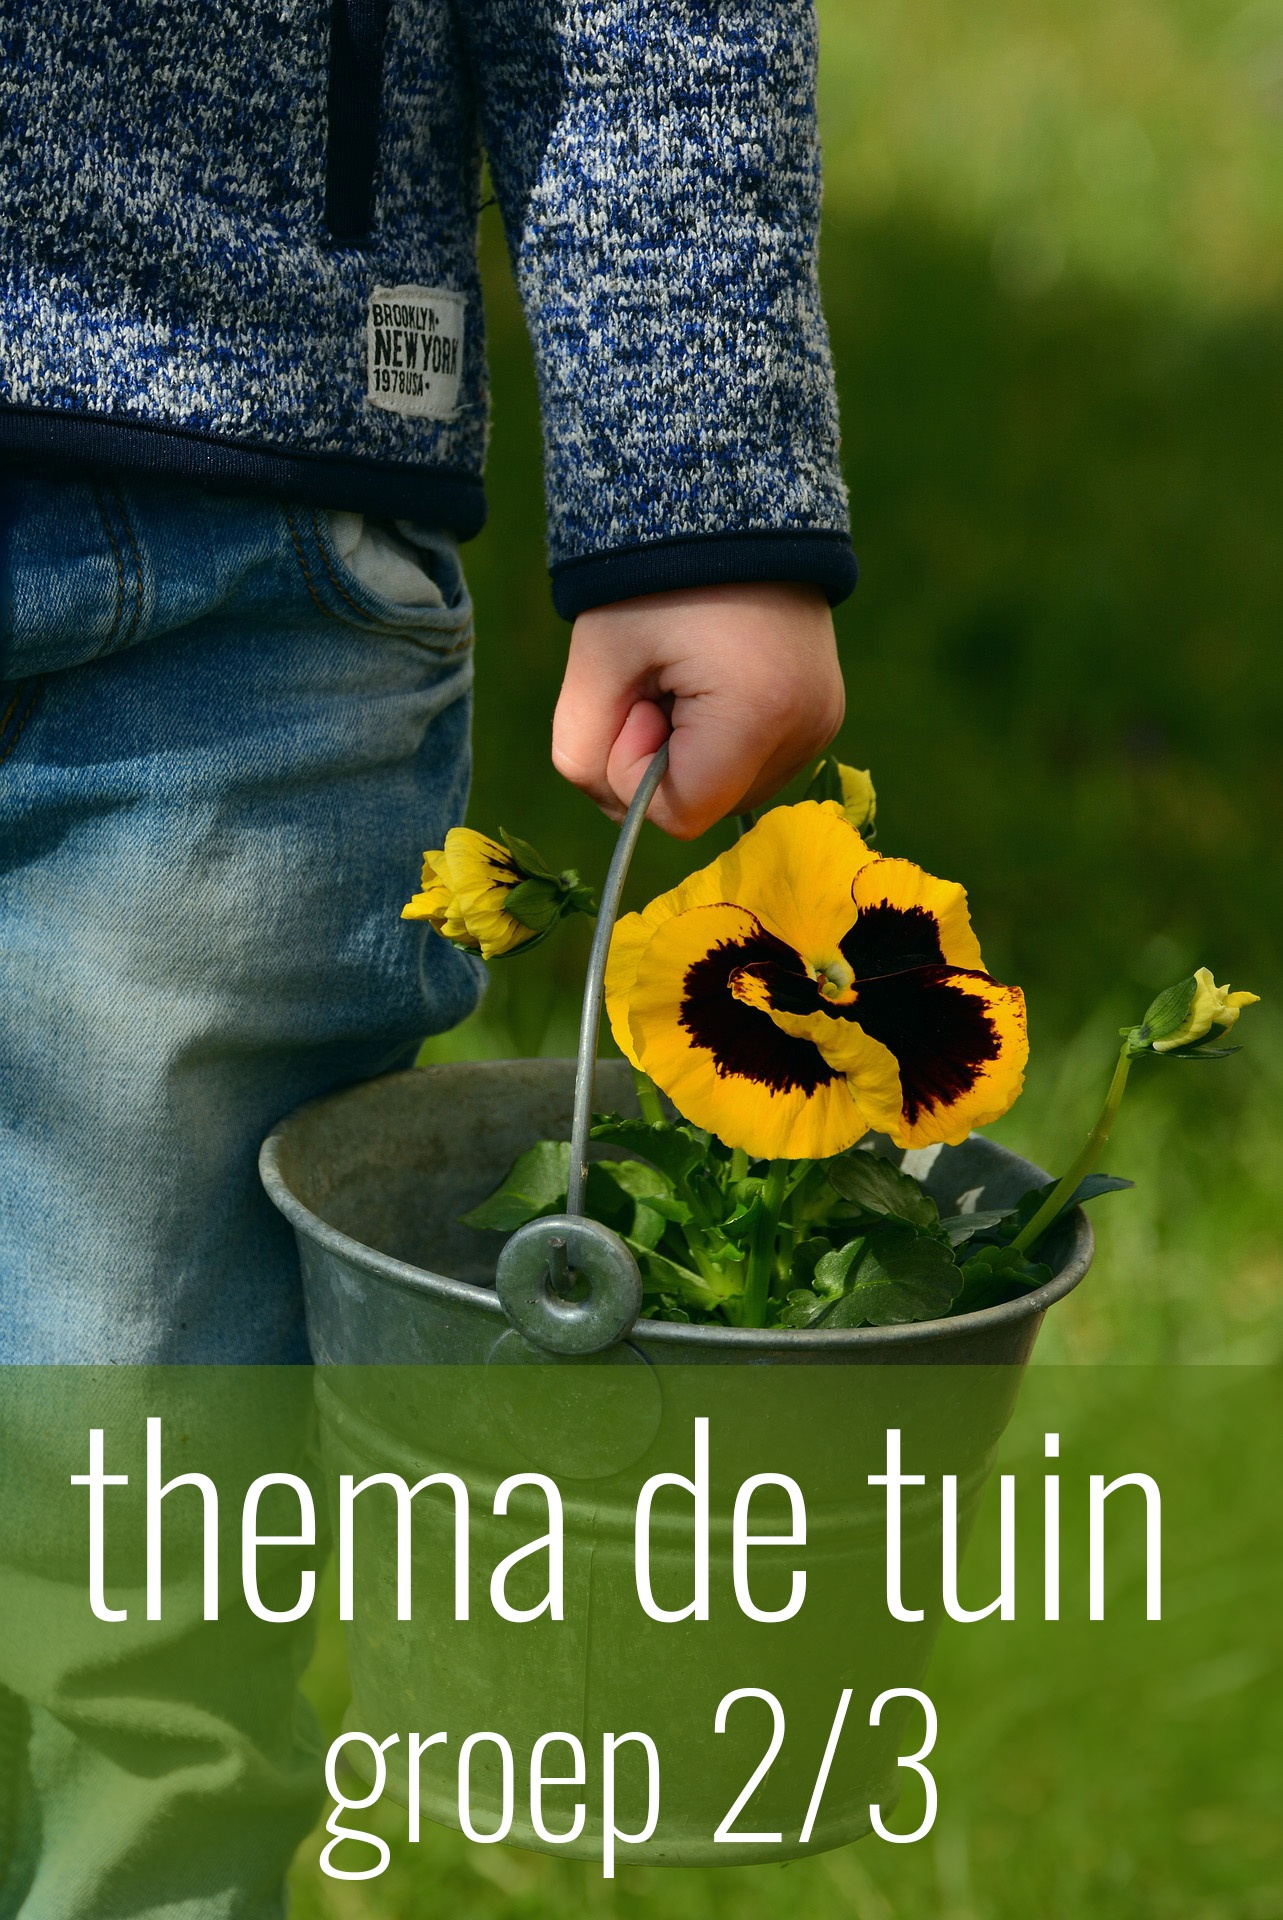 Thema de tuin + themaplanning